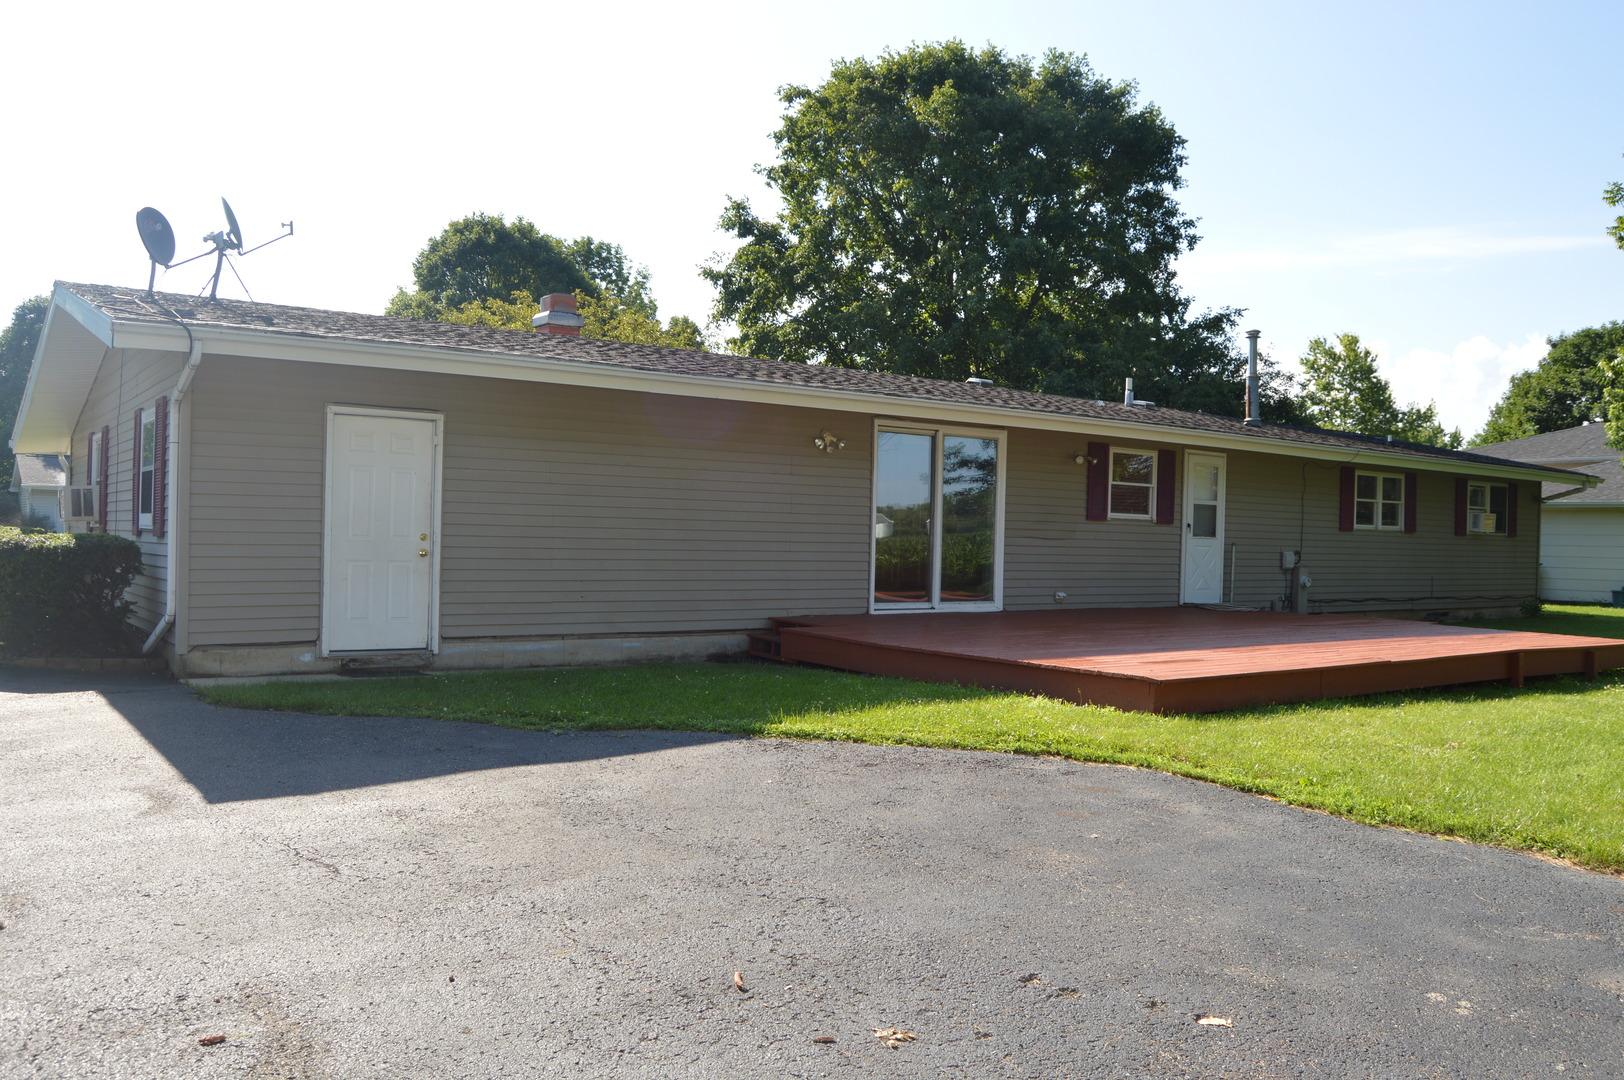 401 10th, Mazon, Illinois, 60444